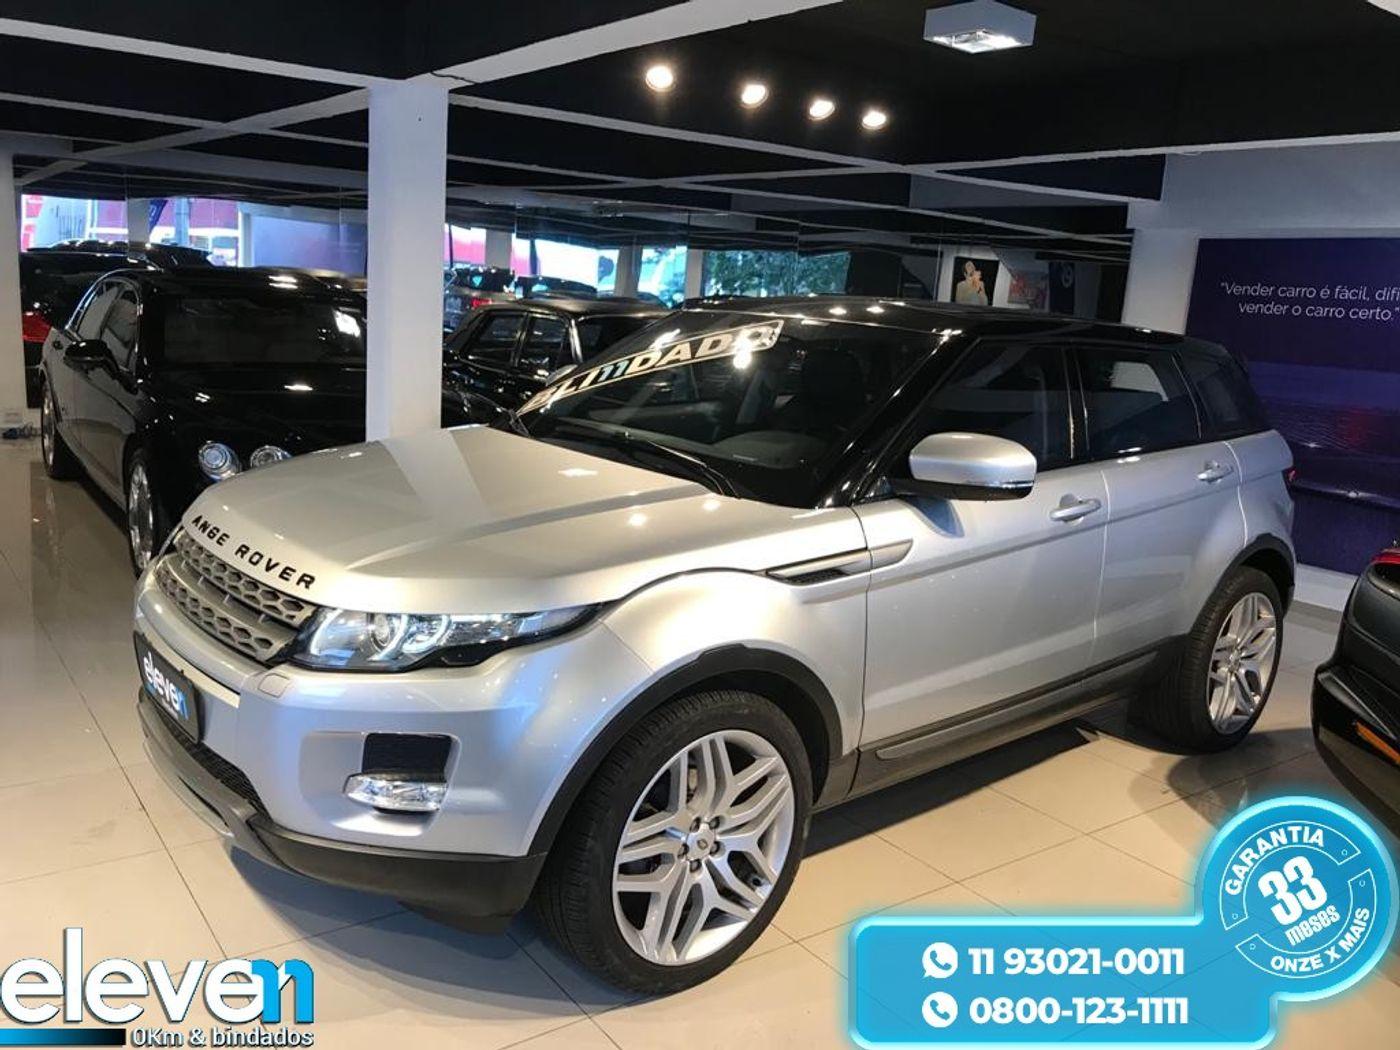 Land Rover Range Rover EVOQUE Pure Tech 2.0 Aut. 5p